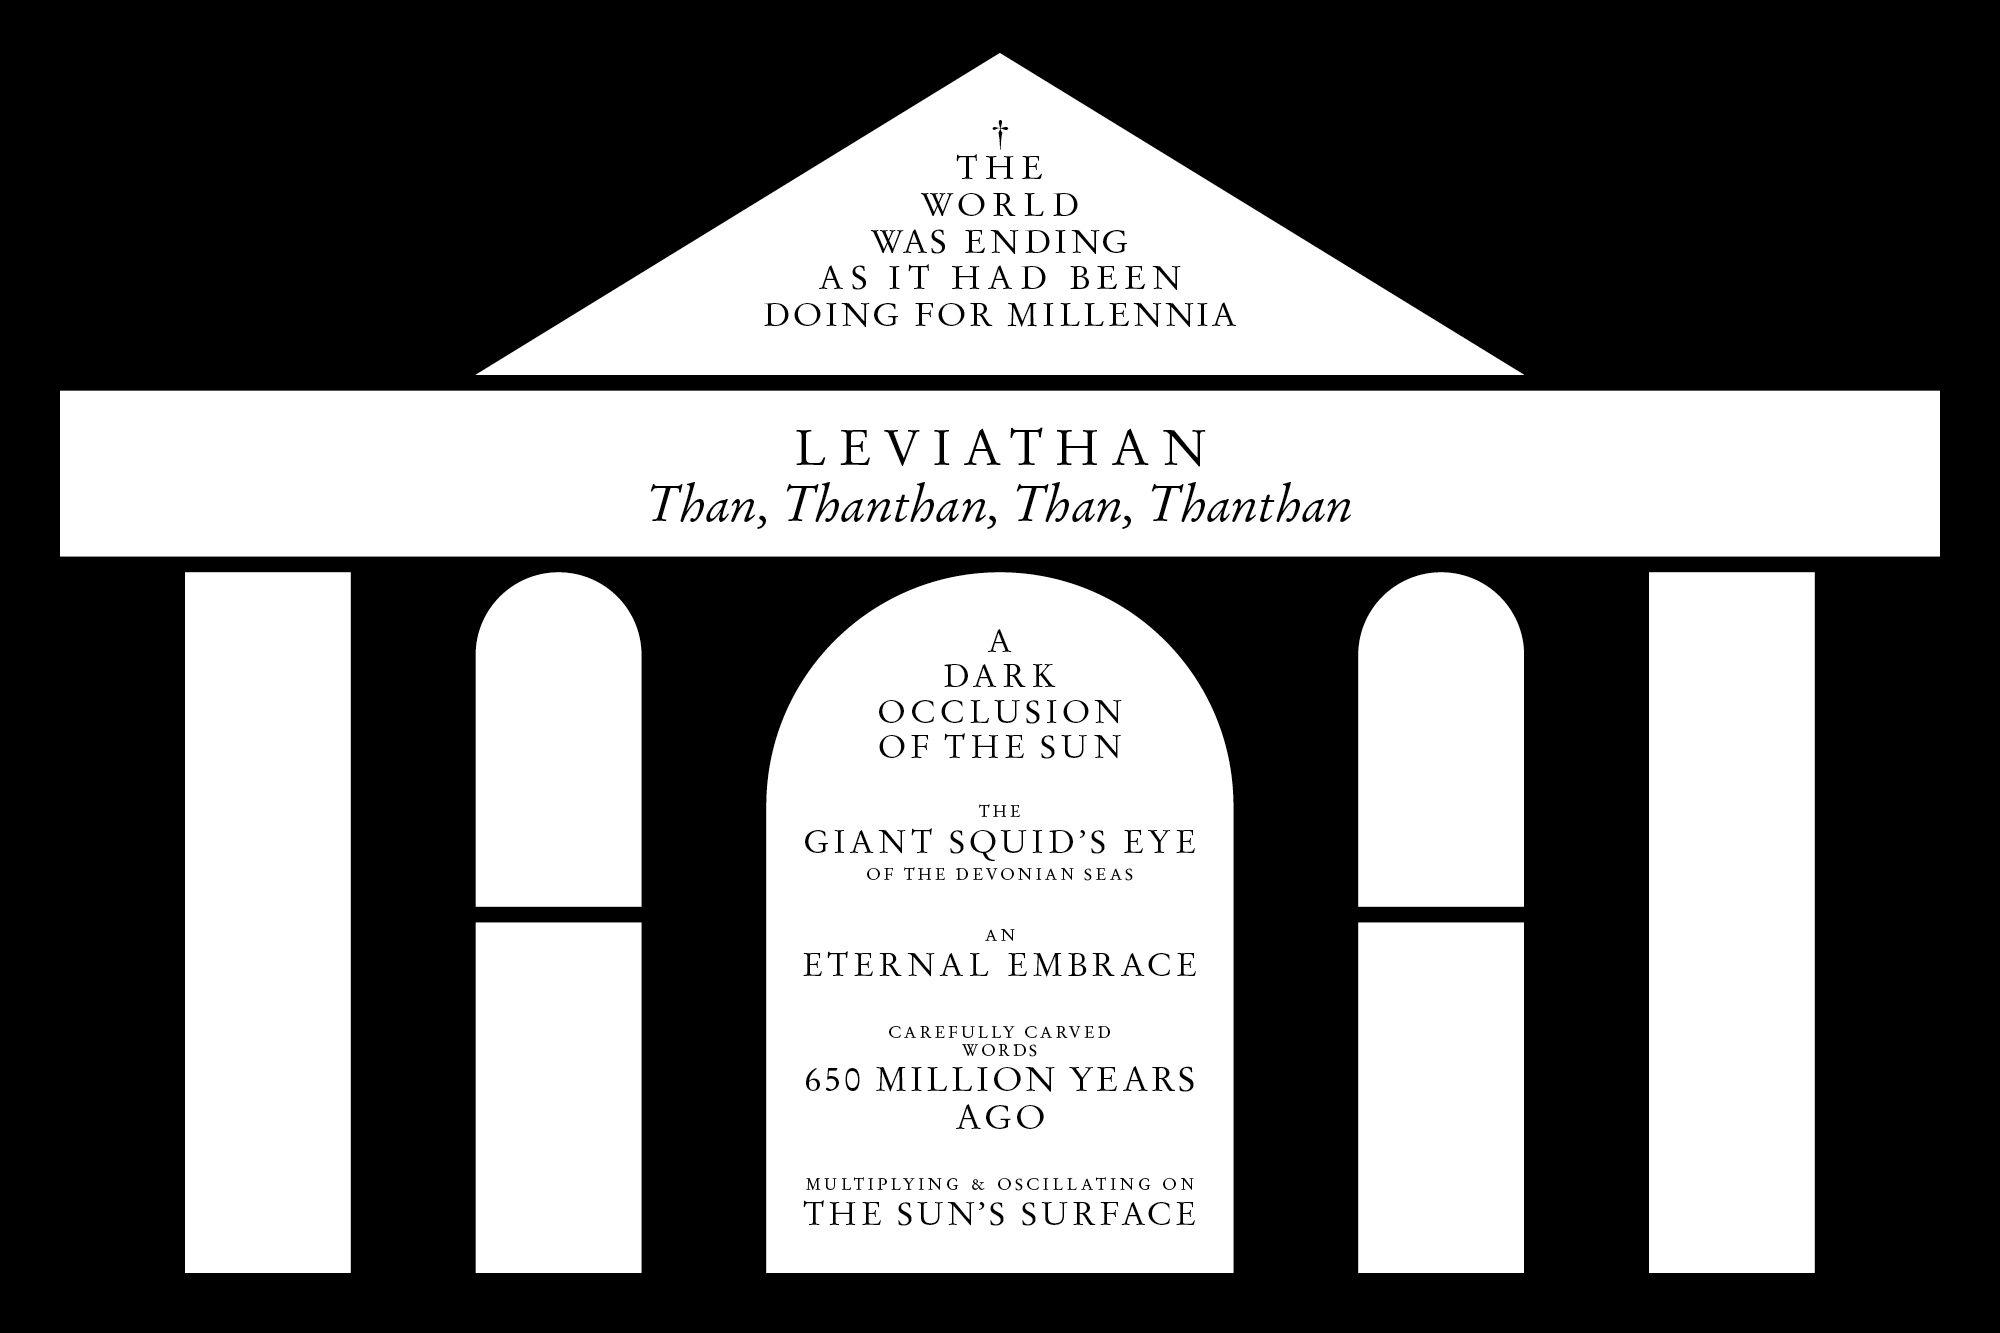 Leviathan Shezad Dawood design misc Pinterest